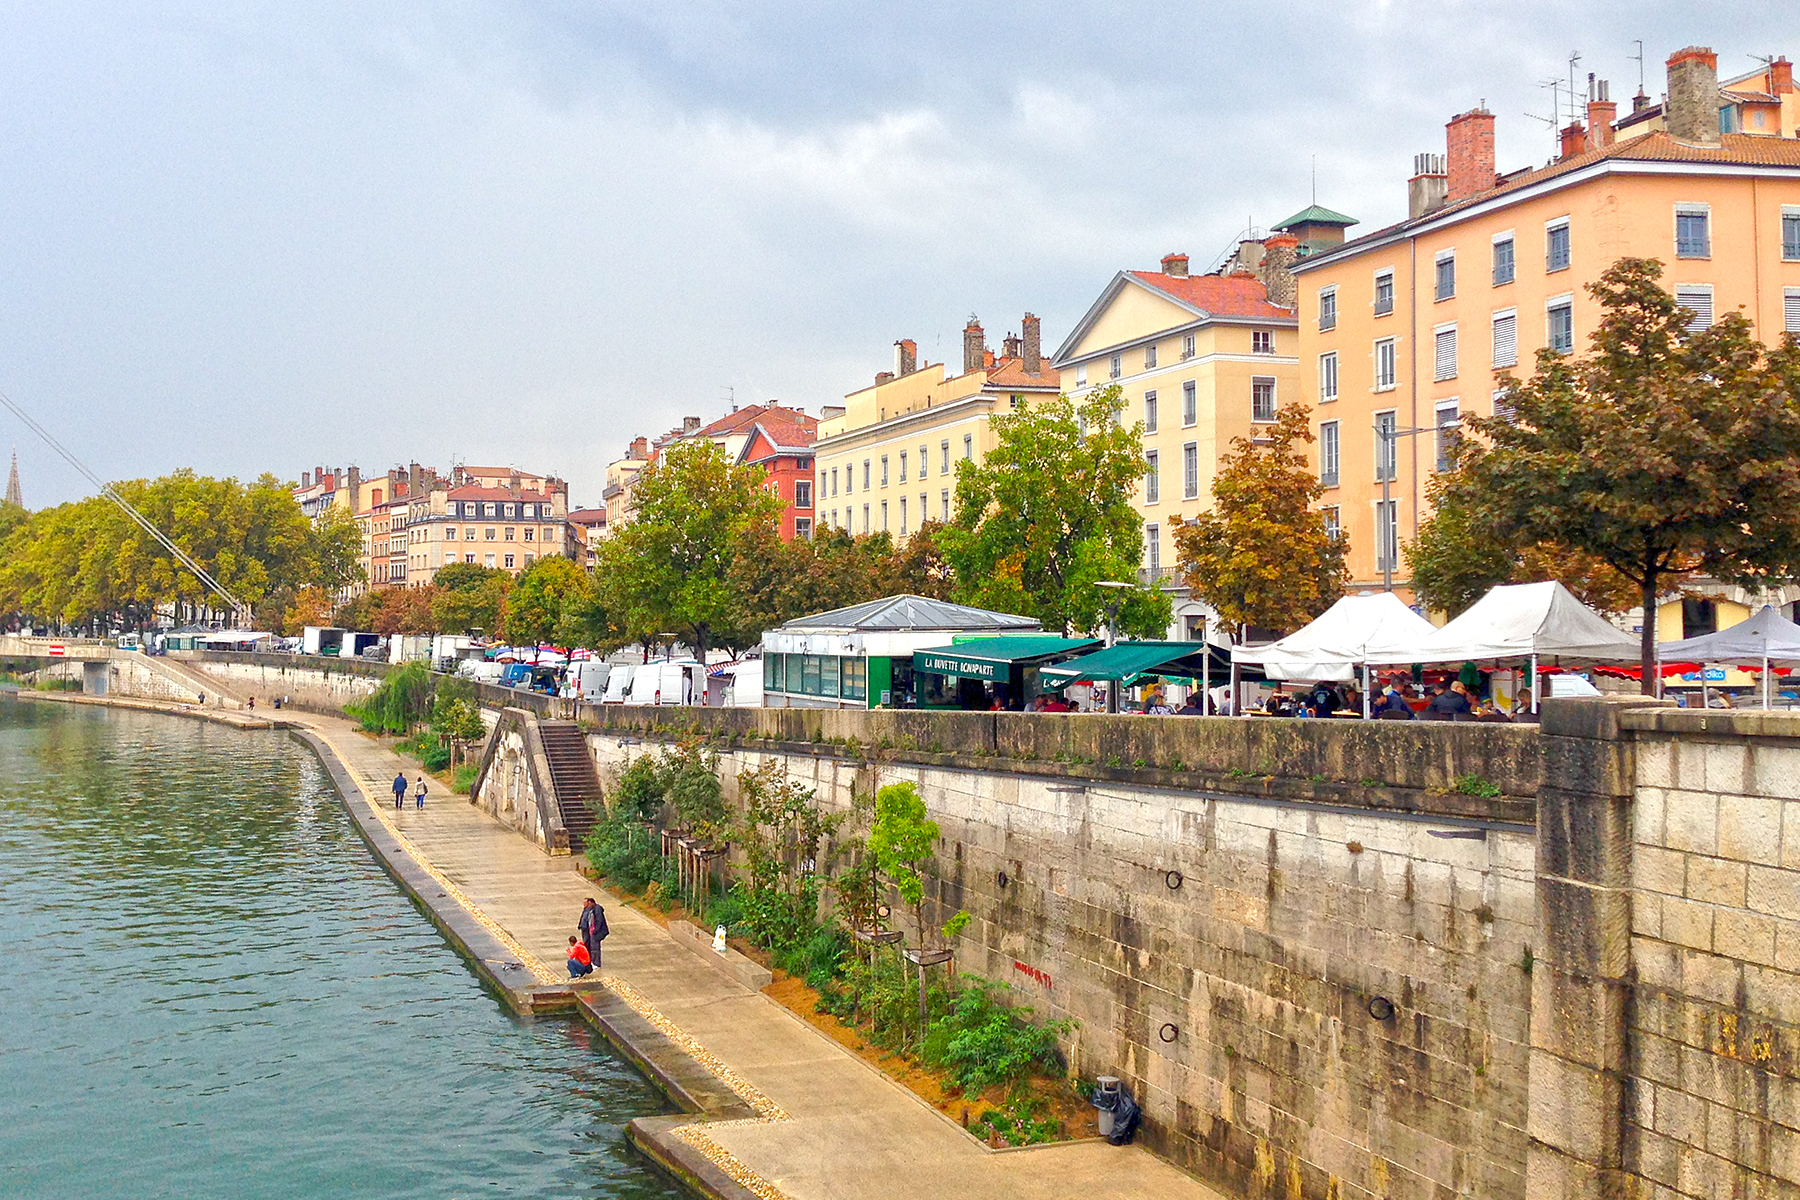 Lyon kurz, knapp & kompakt: 20 Insidertipps für Lyon